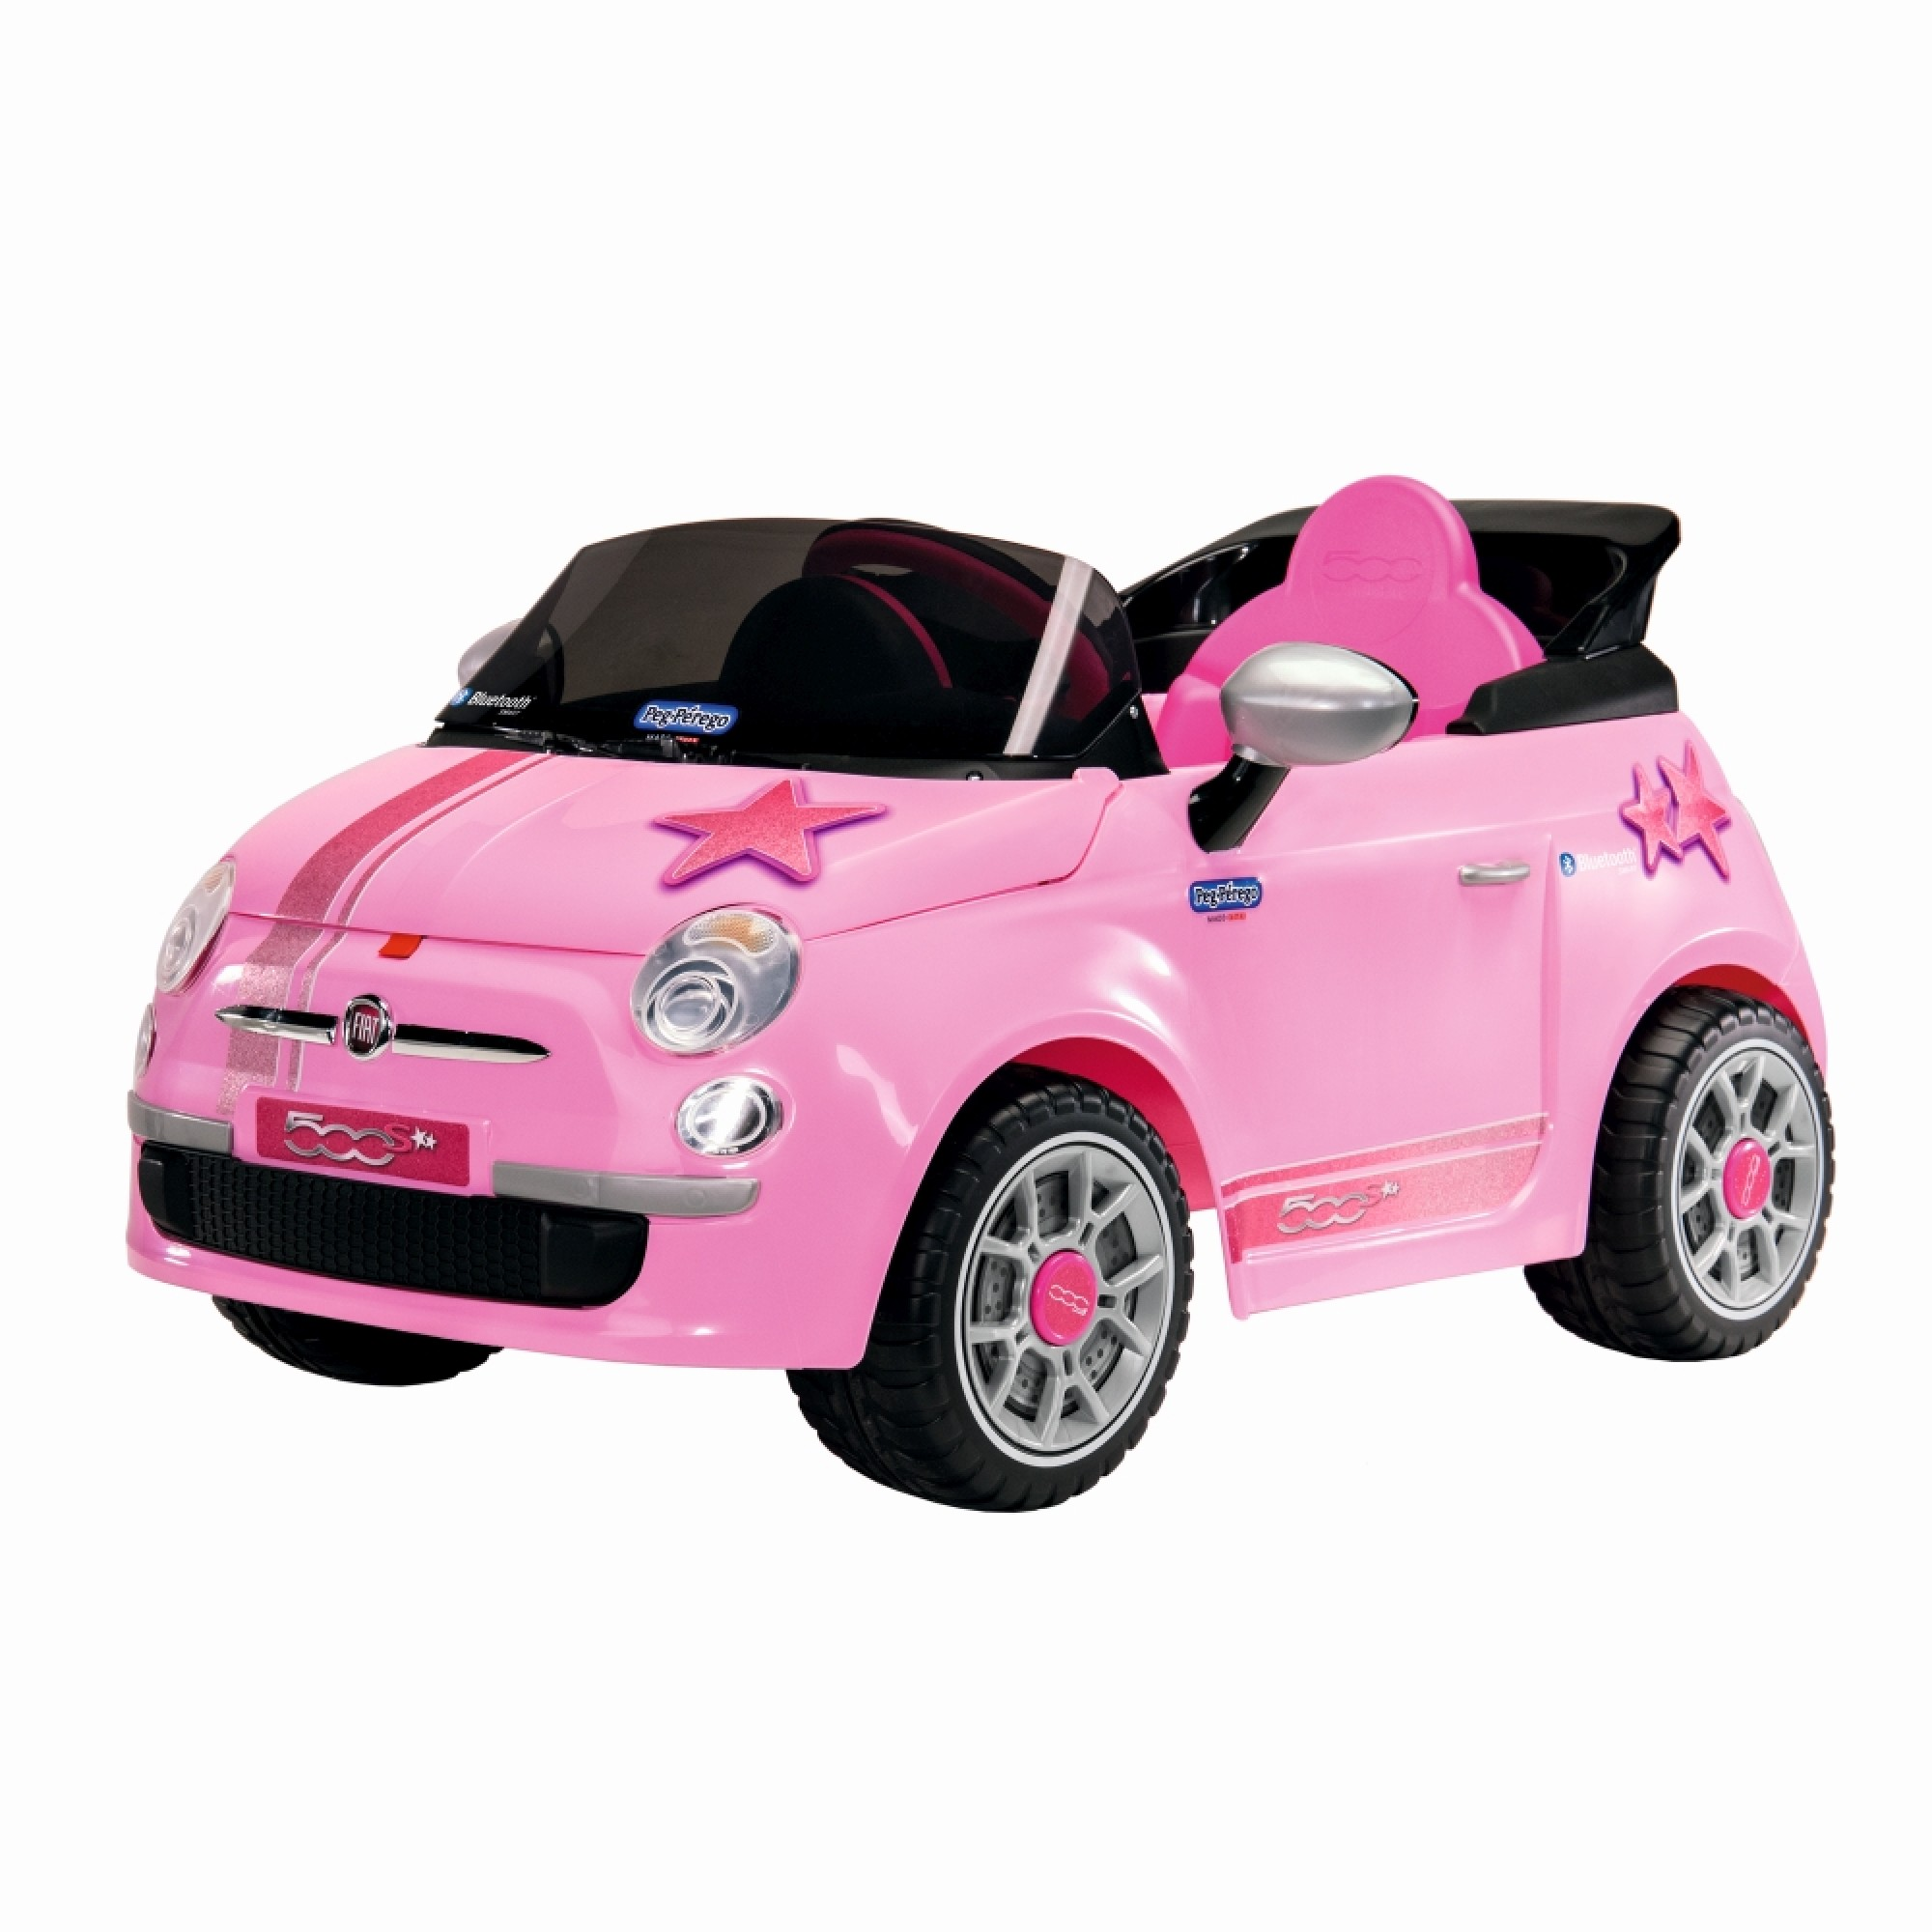 Masina, Fiat 500 Star, Peg Perego, Telecomanda, Pink